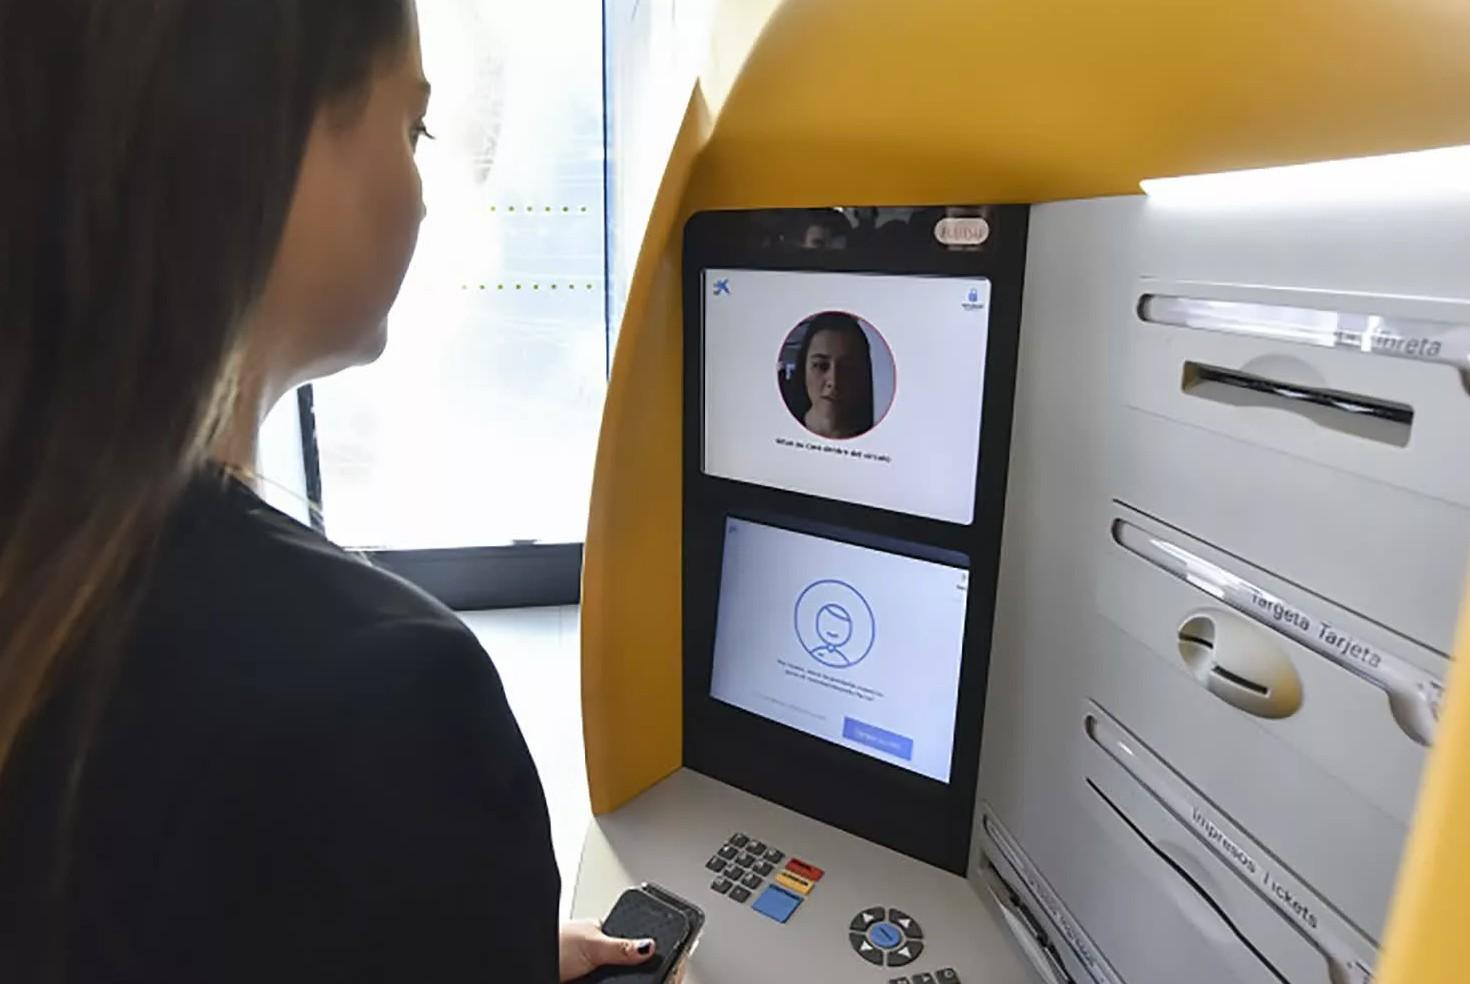 Bankomat skanujący twarz